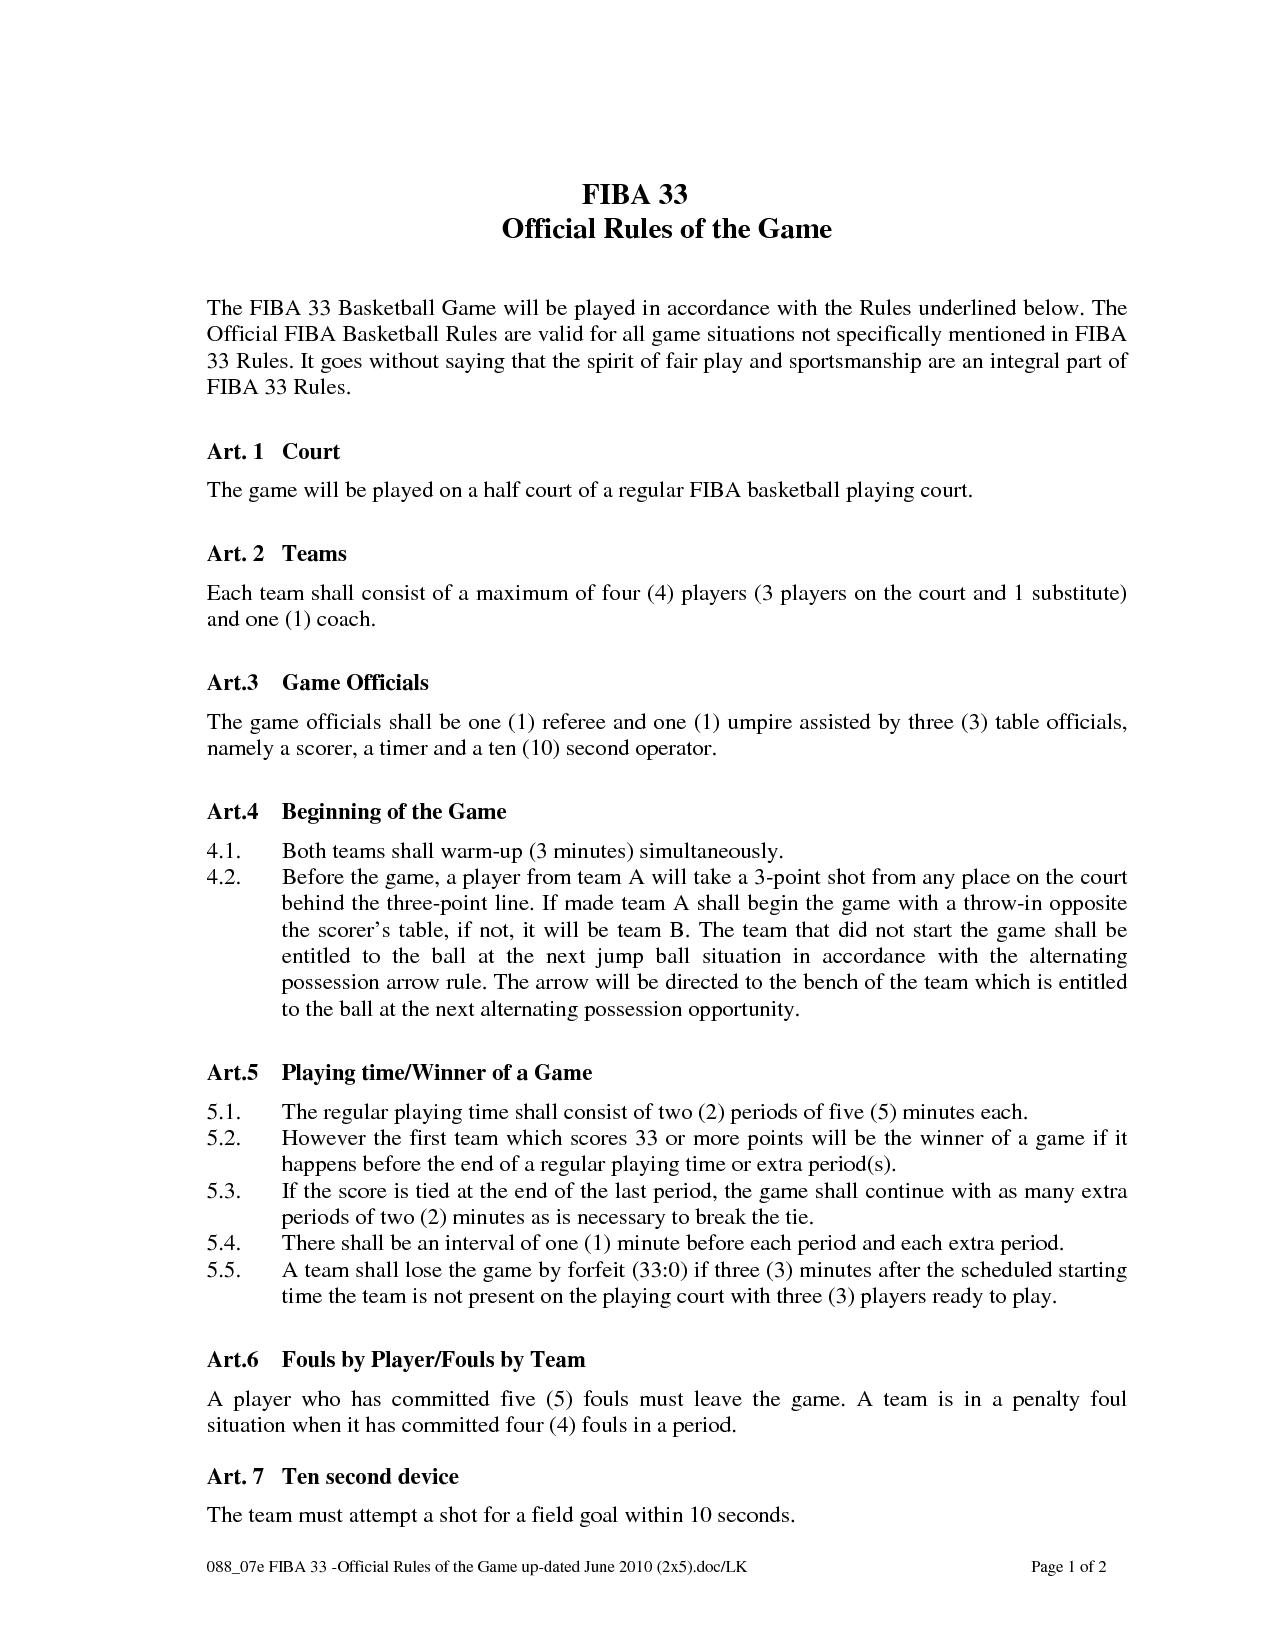 fbi agent resume template